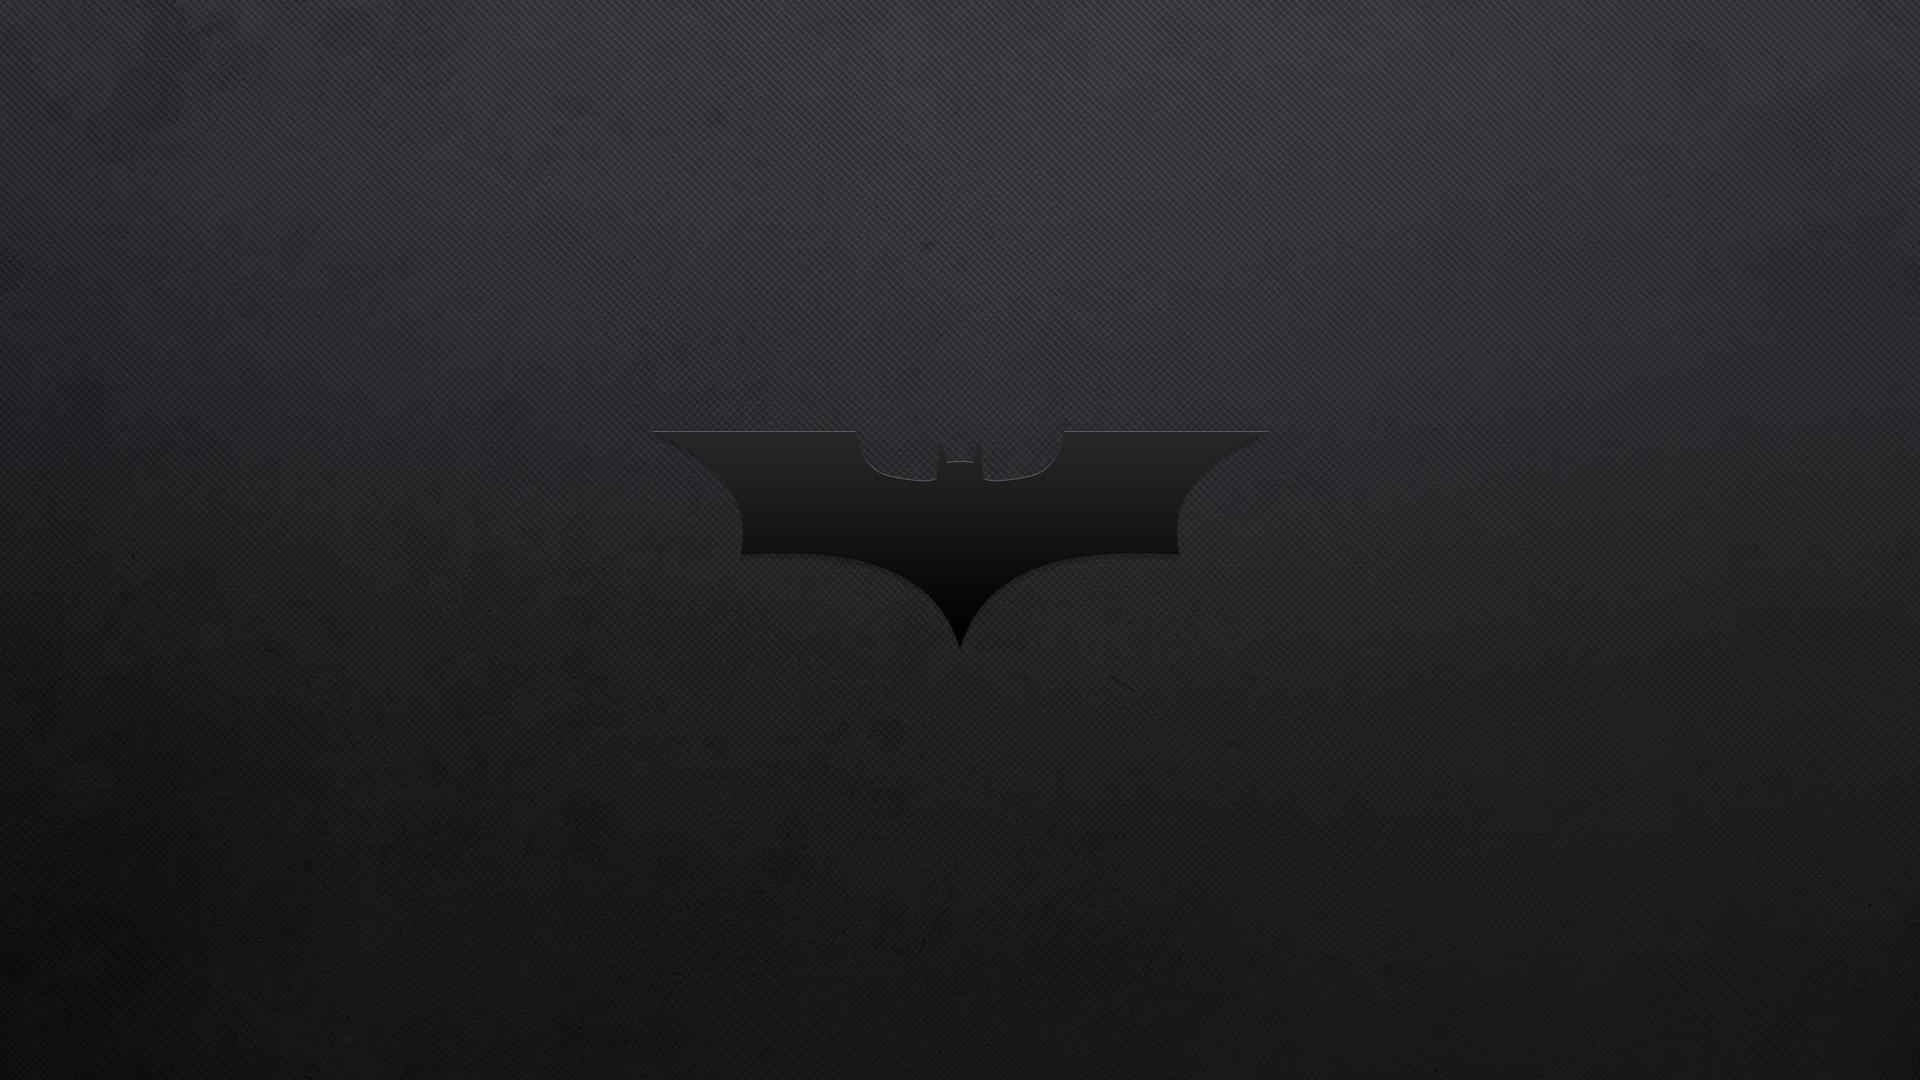 batman logo wallpaper-19